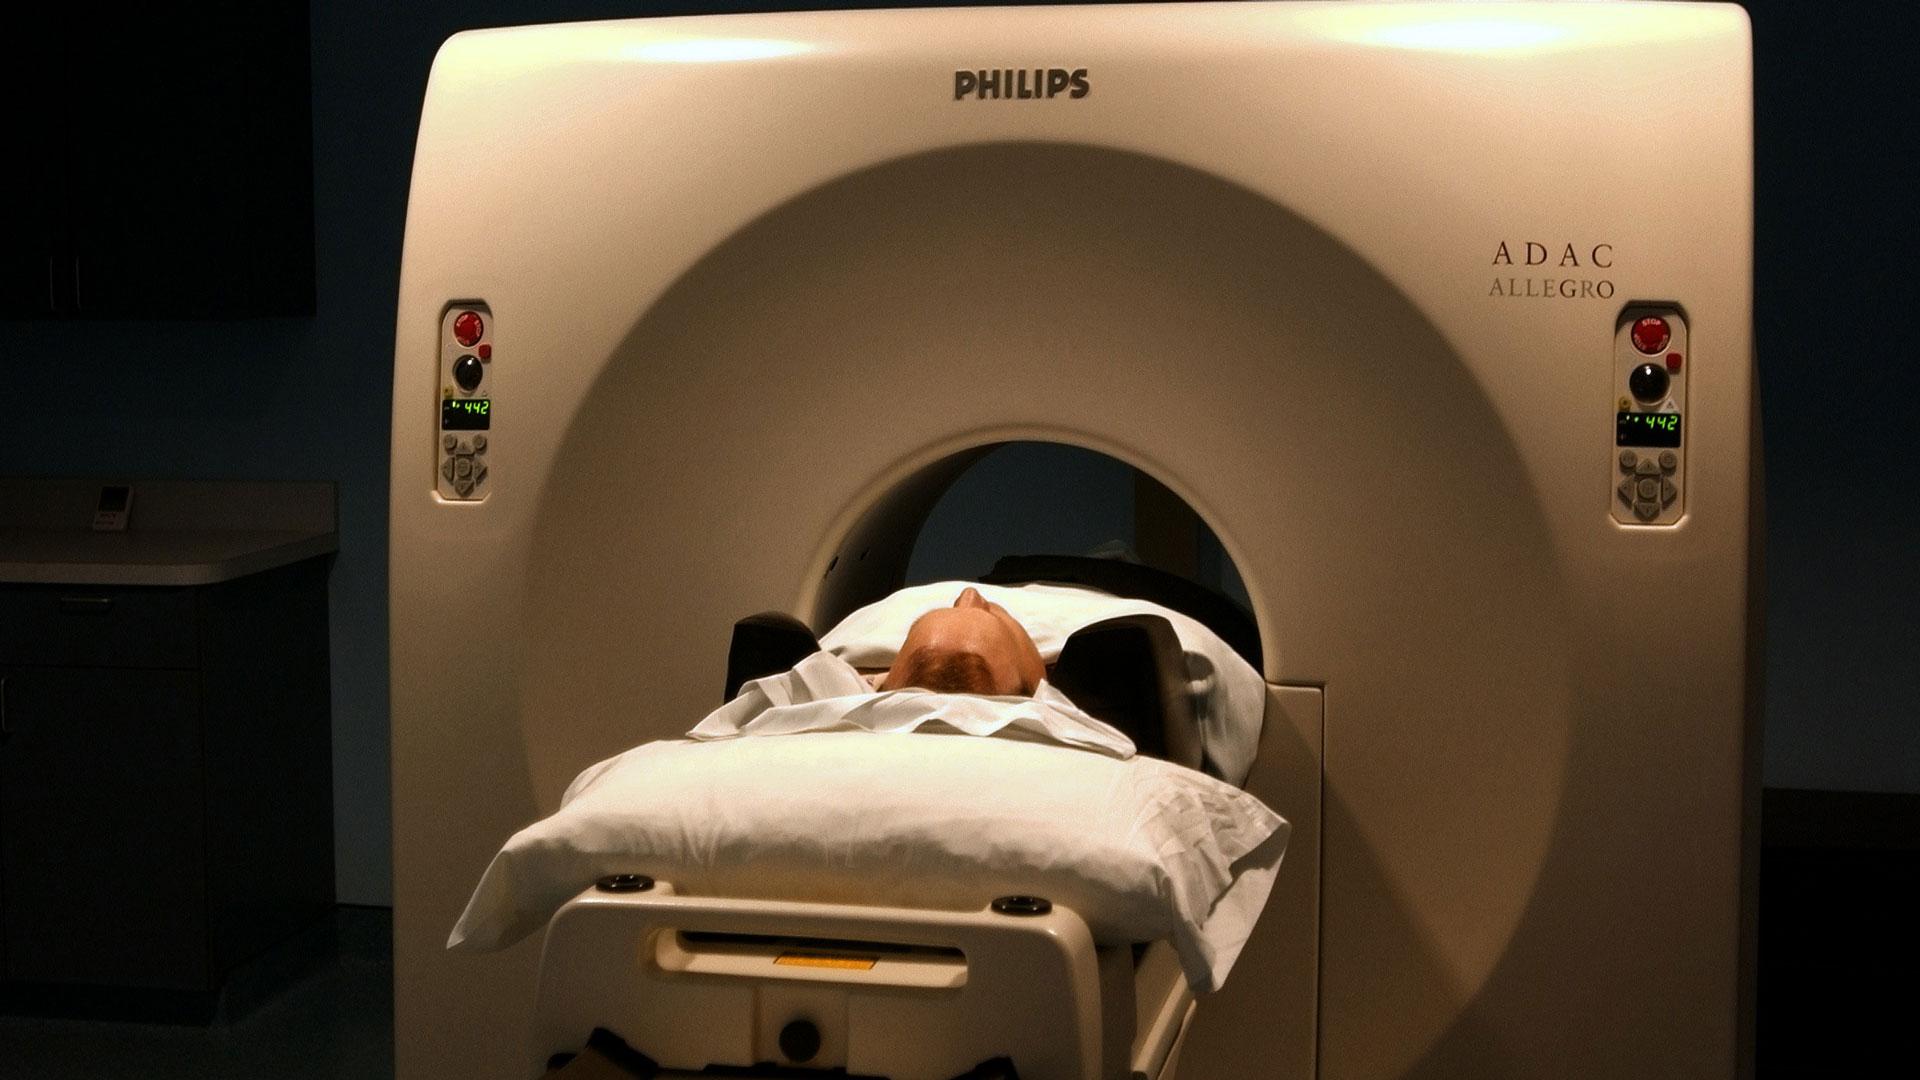 Improve-Your-Radiology-Practice-on-BridgeTownHerald